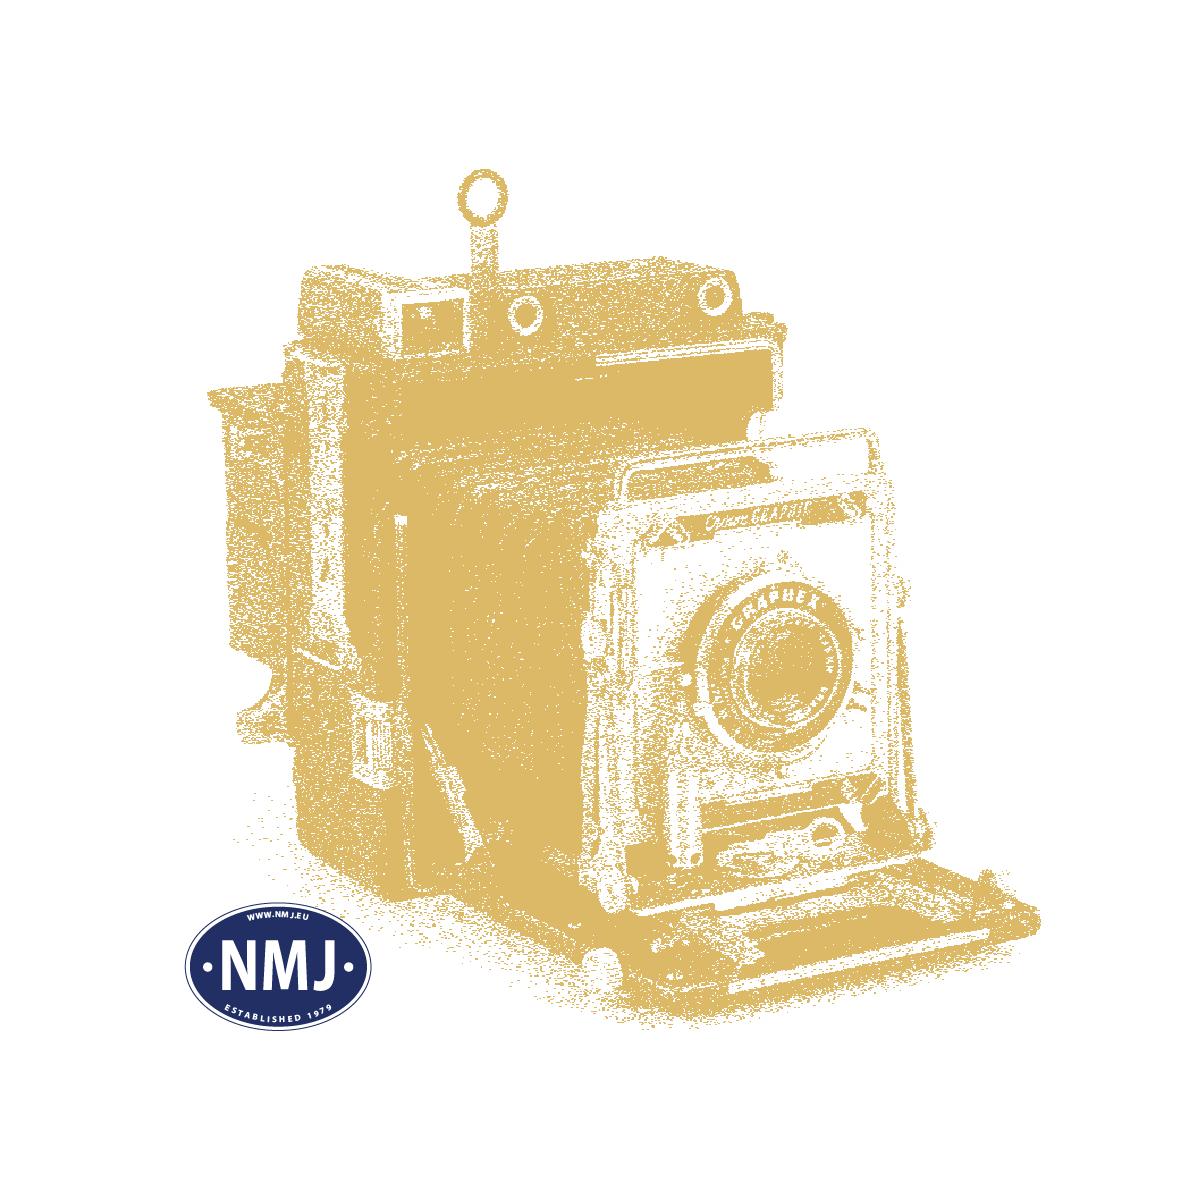 NMJT245401 - NMJ Topline SNCB 204003, Spur 0, DCC m/ Sound